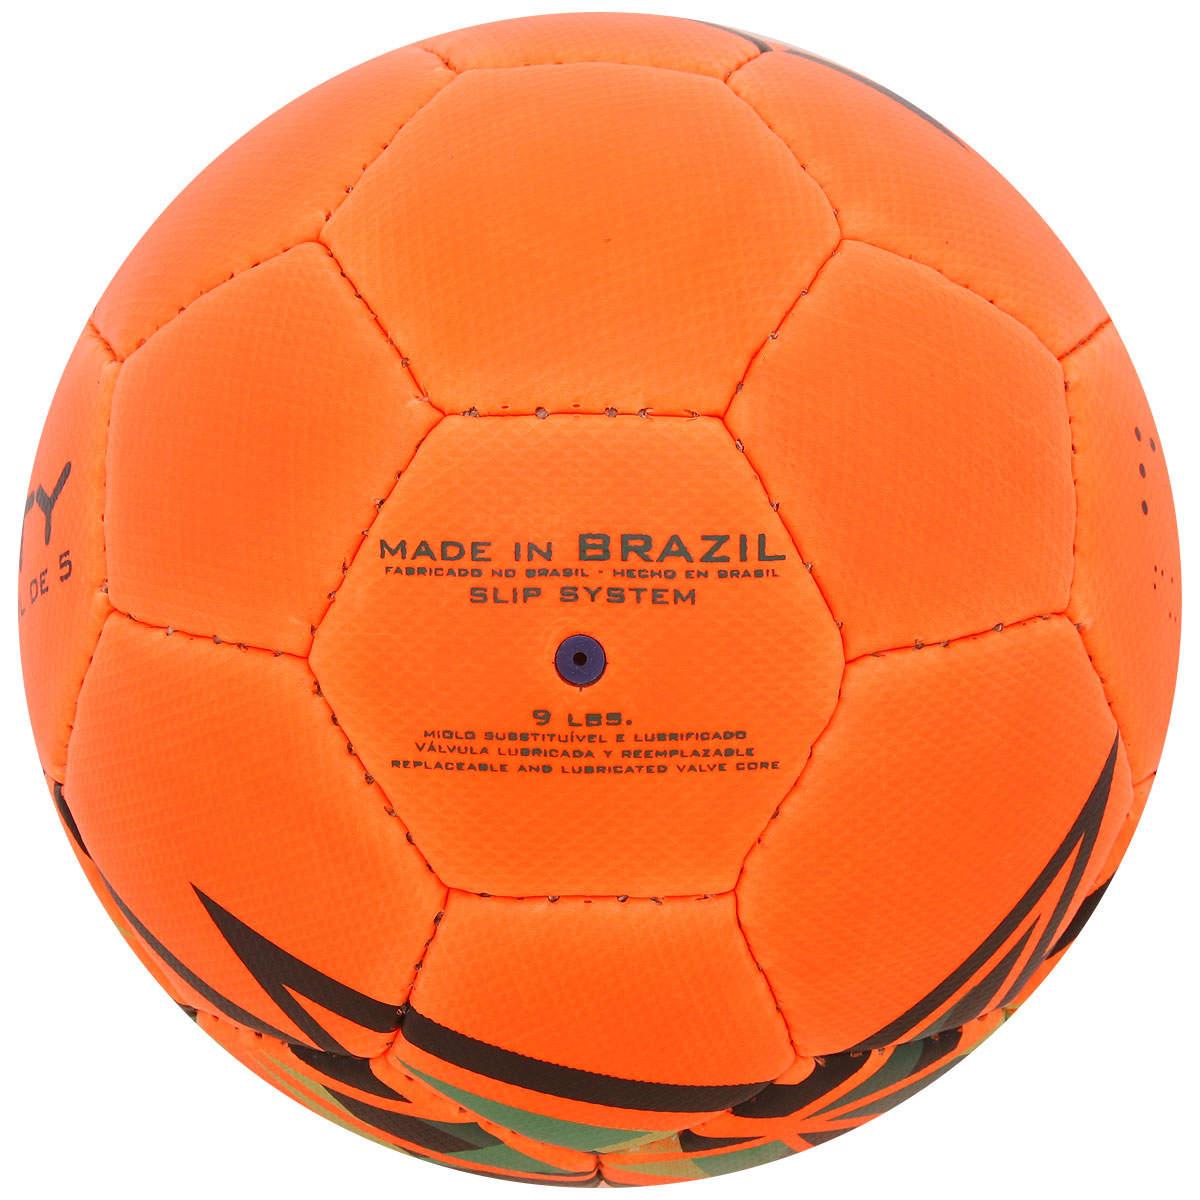 Bola de Futsal Penalty com Guizos